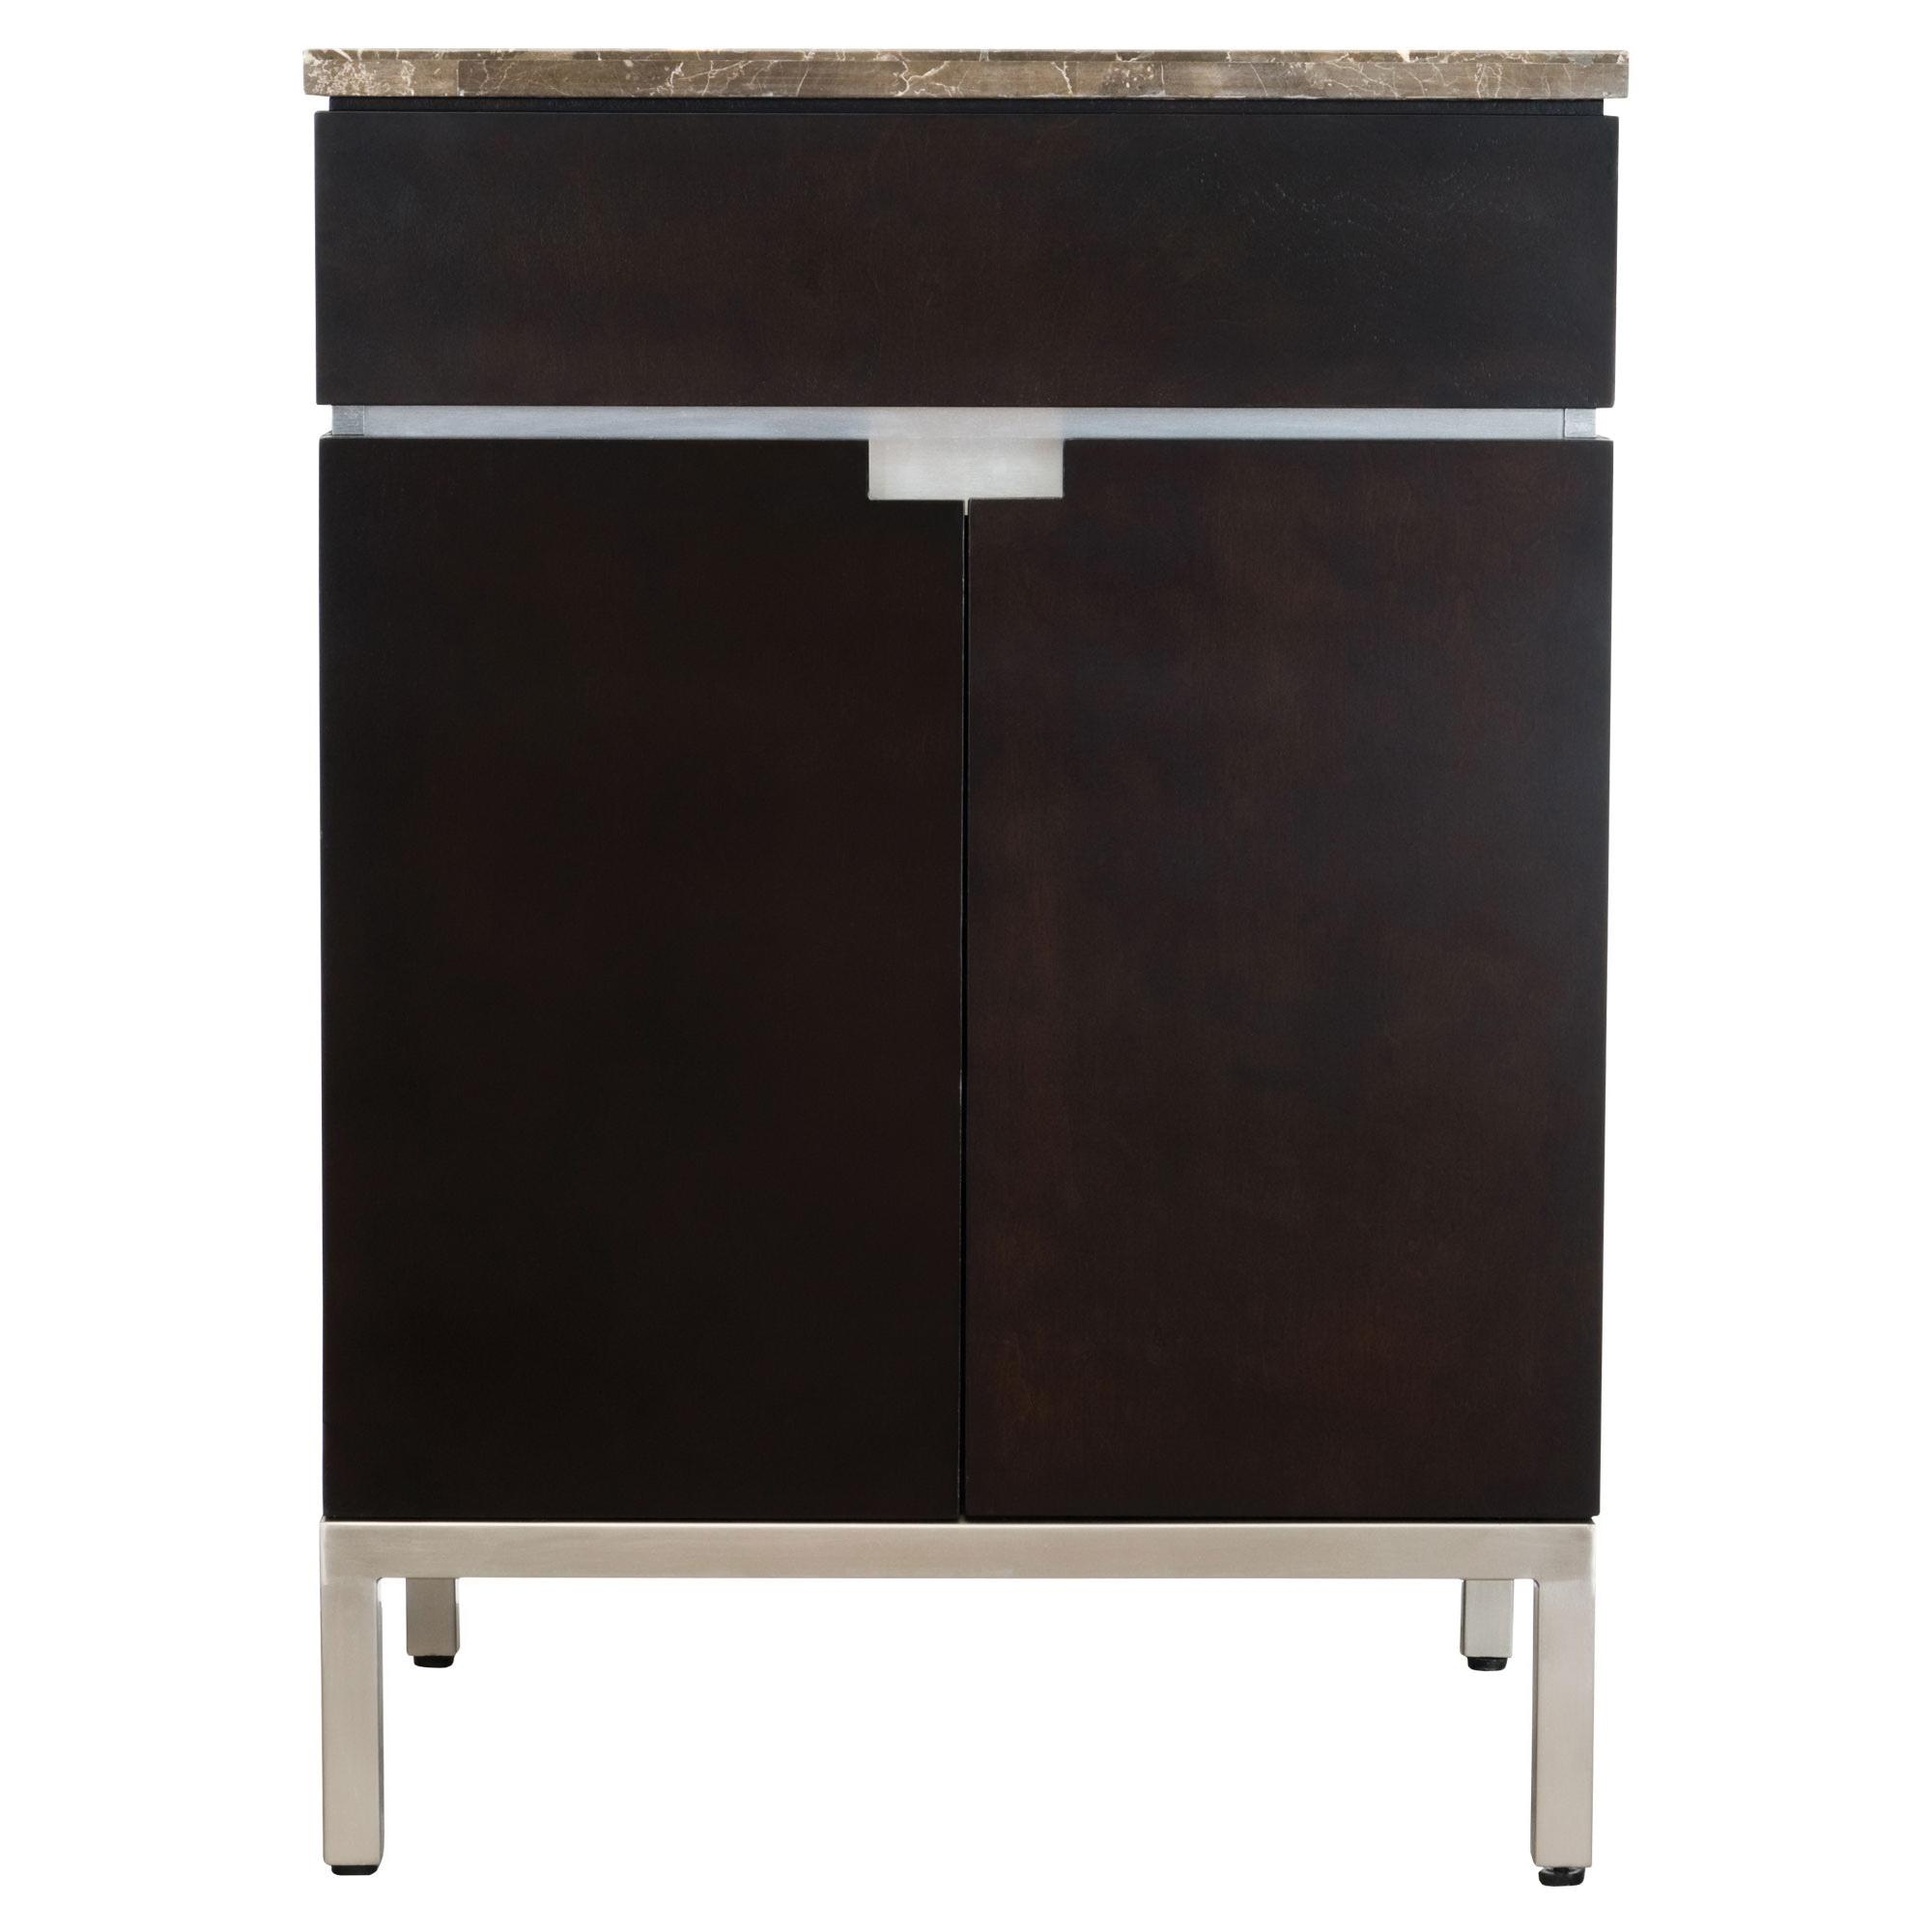 American Standard 9205024.339 Contemporary Vanity Cabinet Only, Studio™, 30 in OAH x 18-1/4 in OAW x 22 in OAD, Freestanding Mount, Import